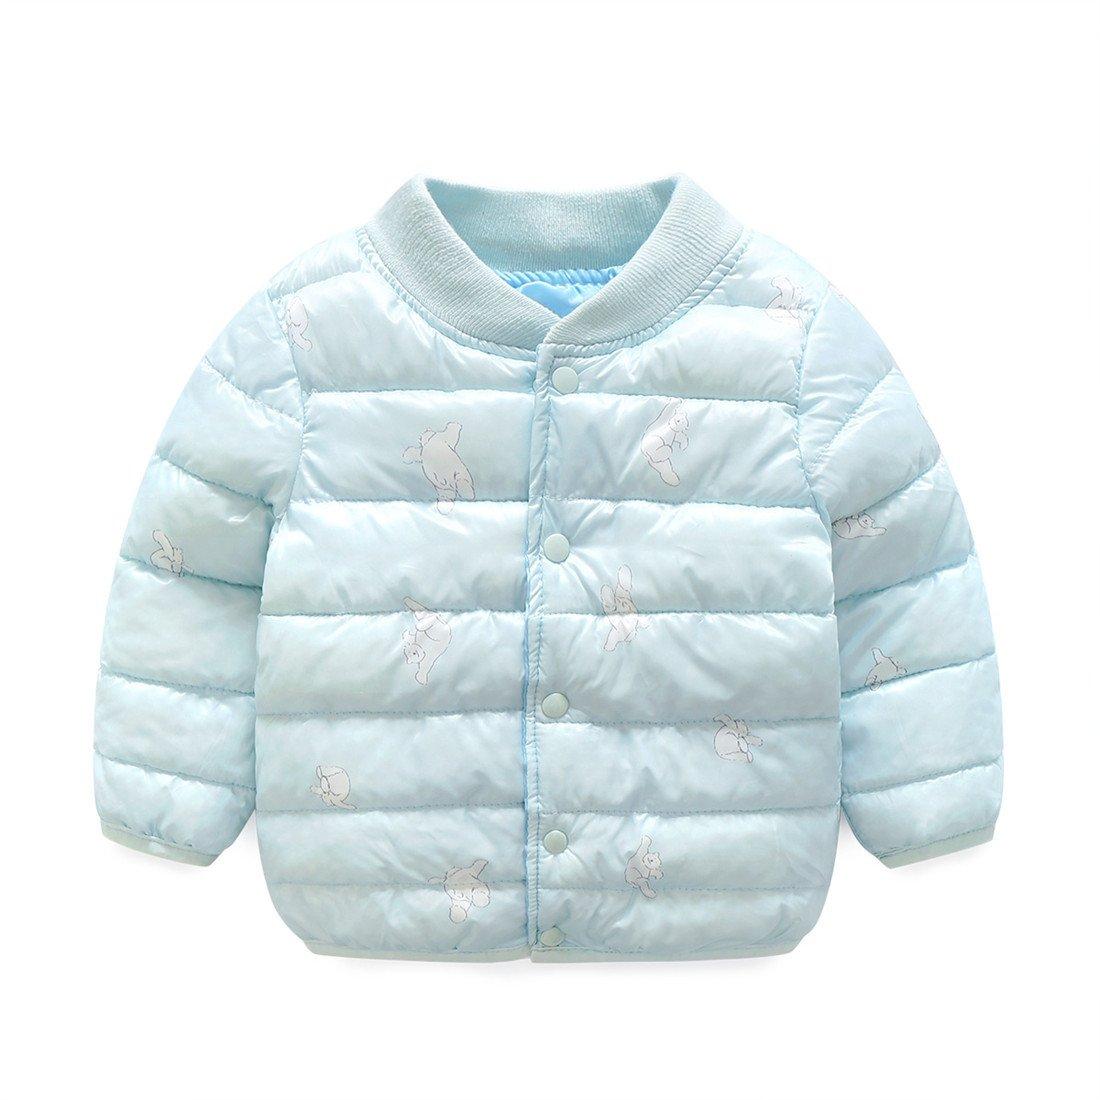 680bf854ea2b Nancy Toddler Kids Baby Boys Girls Outerwear woolen warm Winter ...